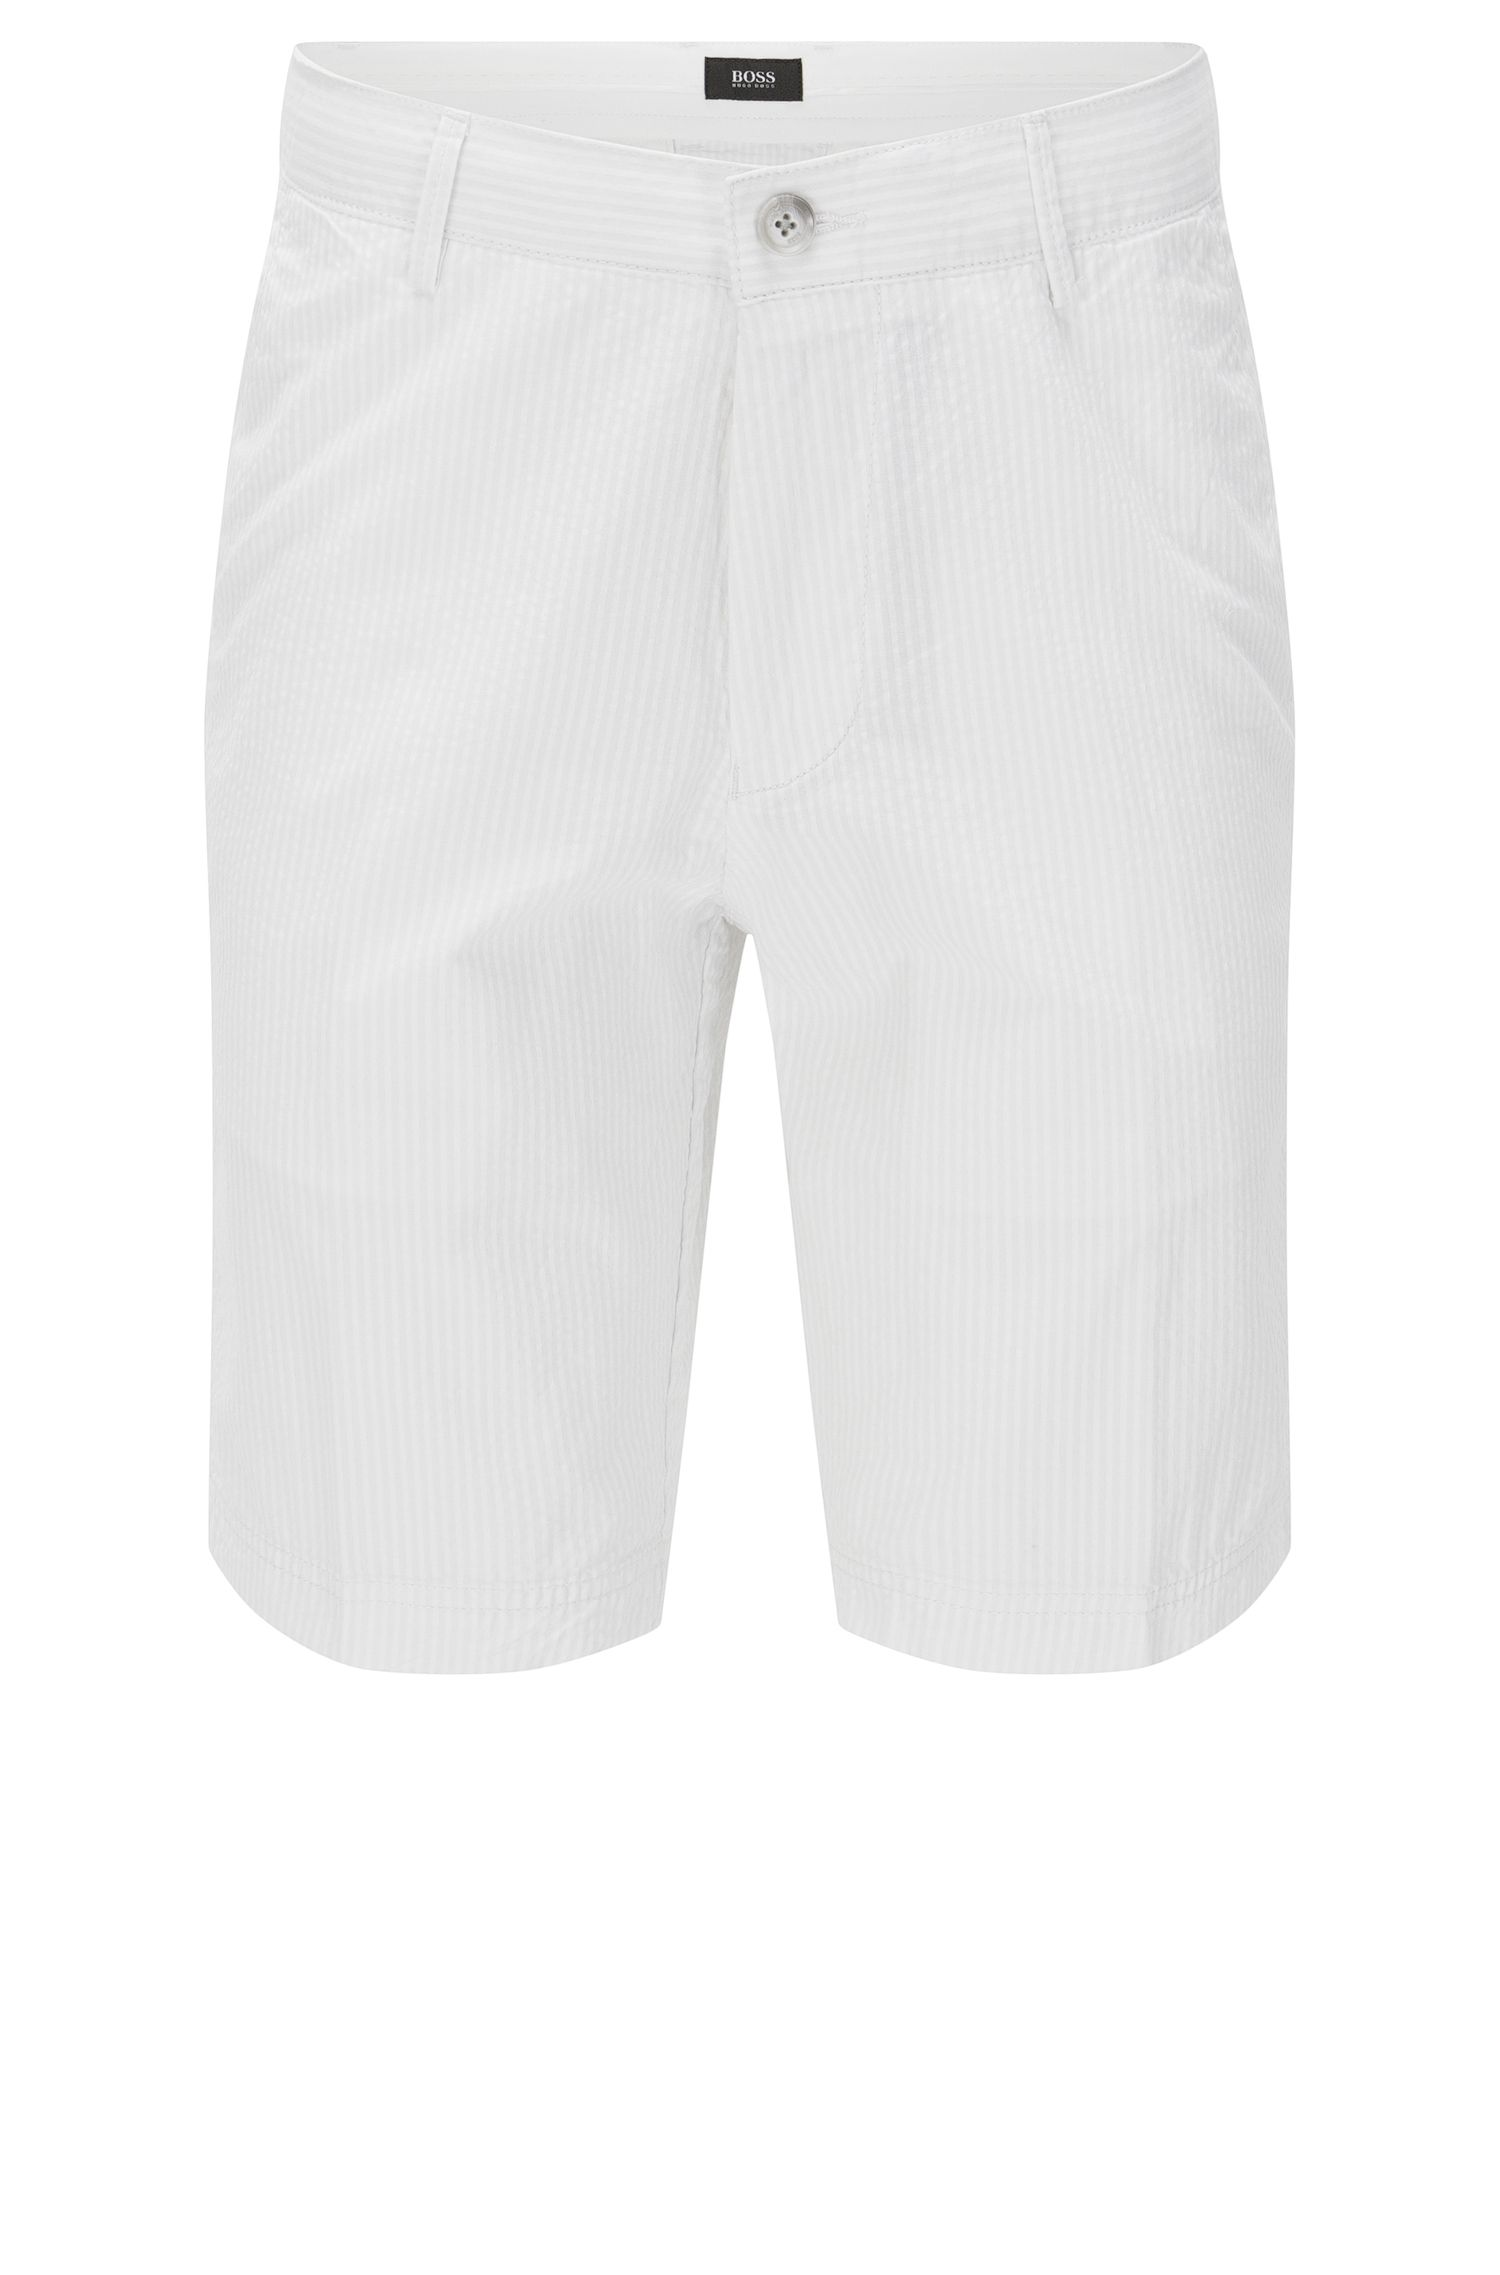 Cotton Tonal Seersucker Short, Regular Fit | Crigan Short W